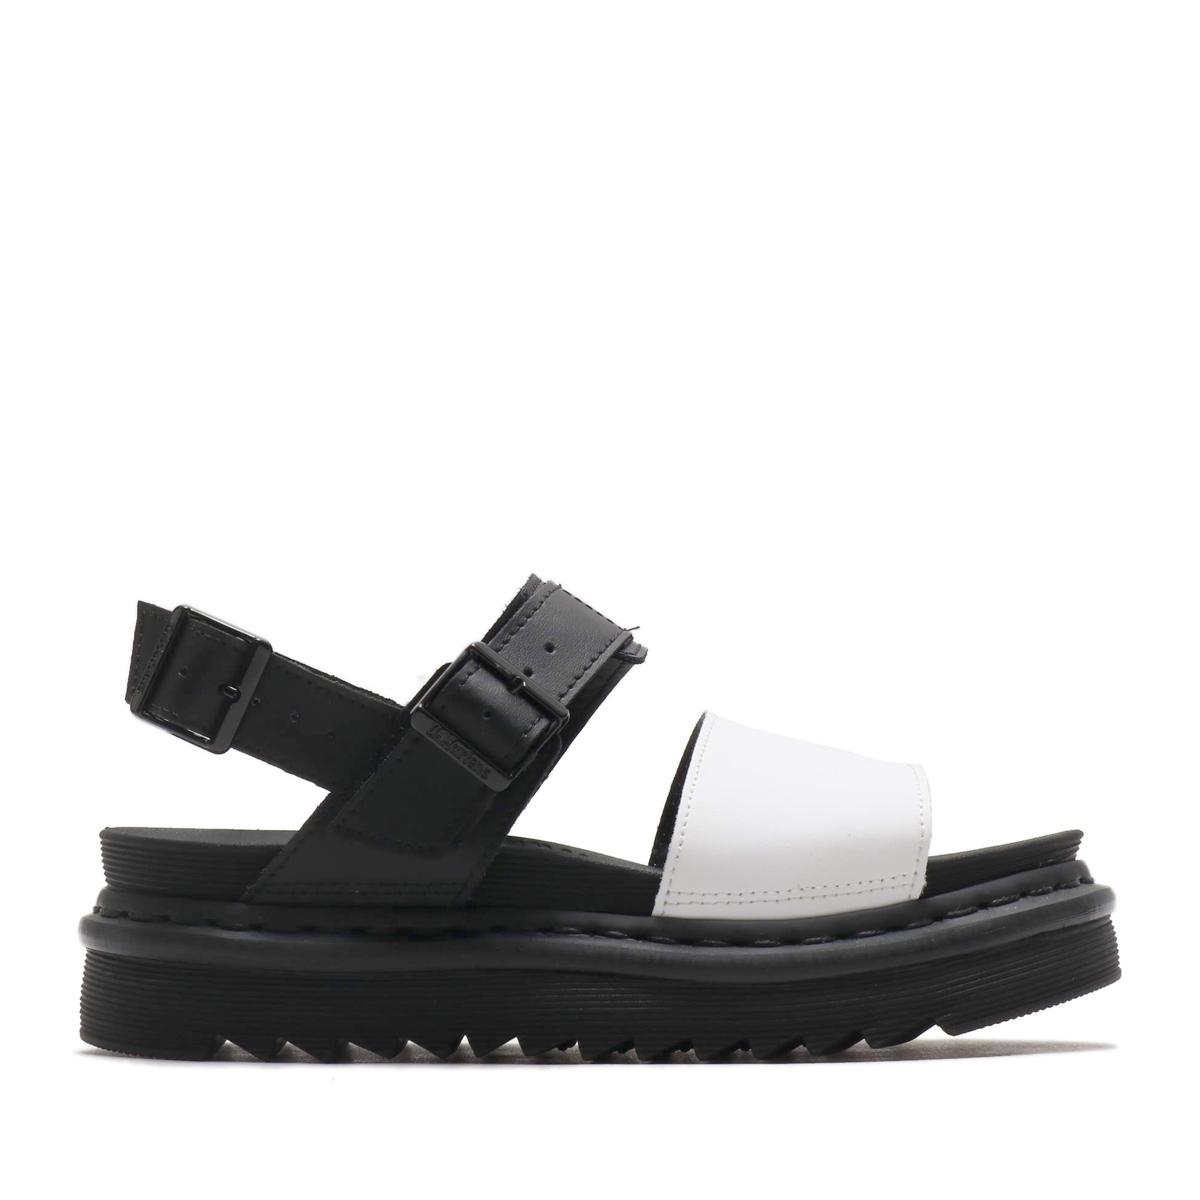 Dr.Martens Voss Strap Sandal(Black/White Hydro Leather)(ドクターマーチン ボス ストラップ サンダル)【レディース】【サンダル】【19SS-I】